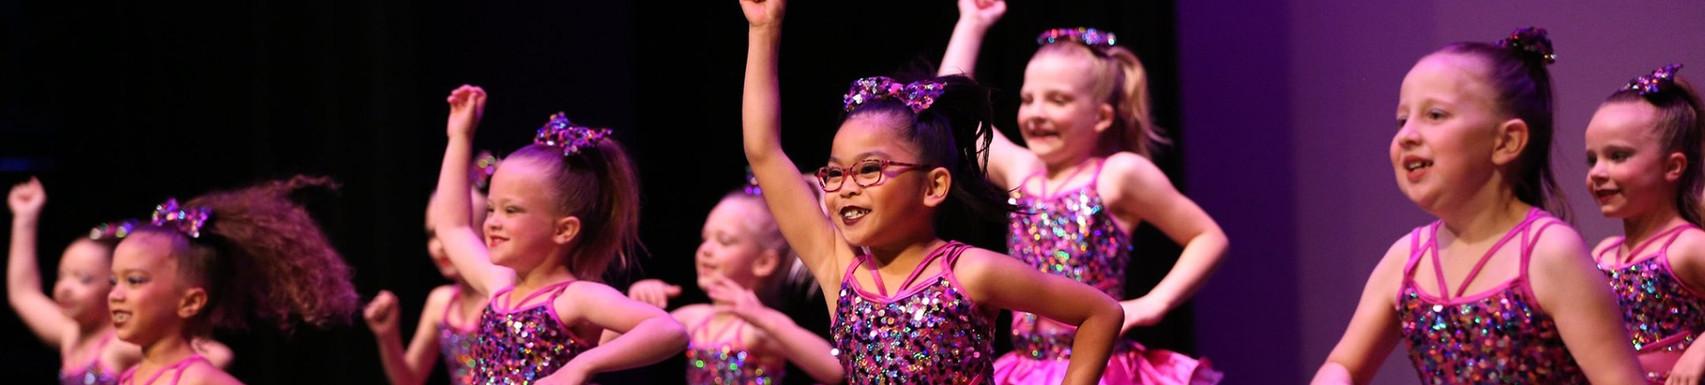 allegro dance studio kent wa - jazz dance kids